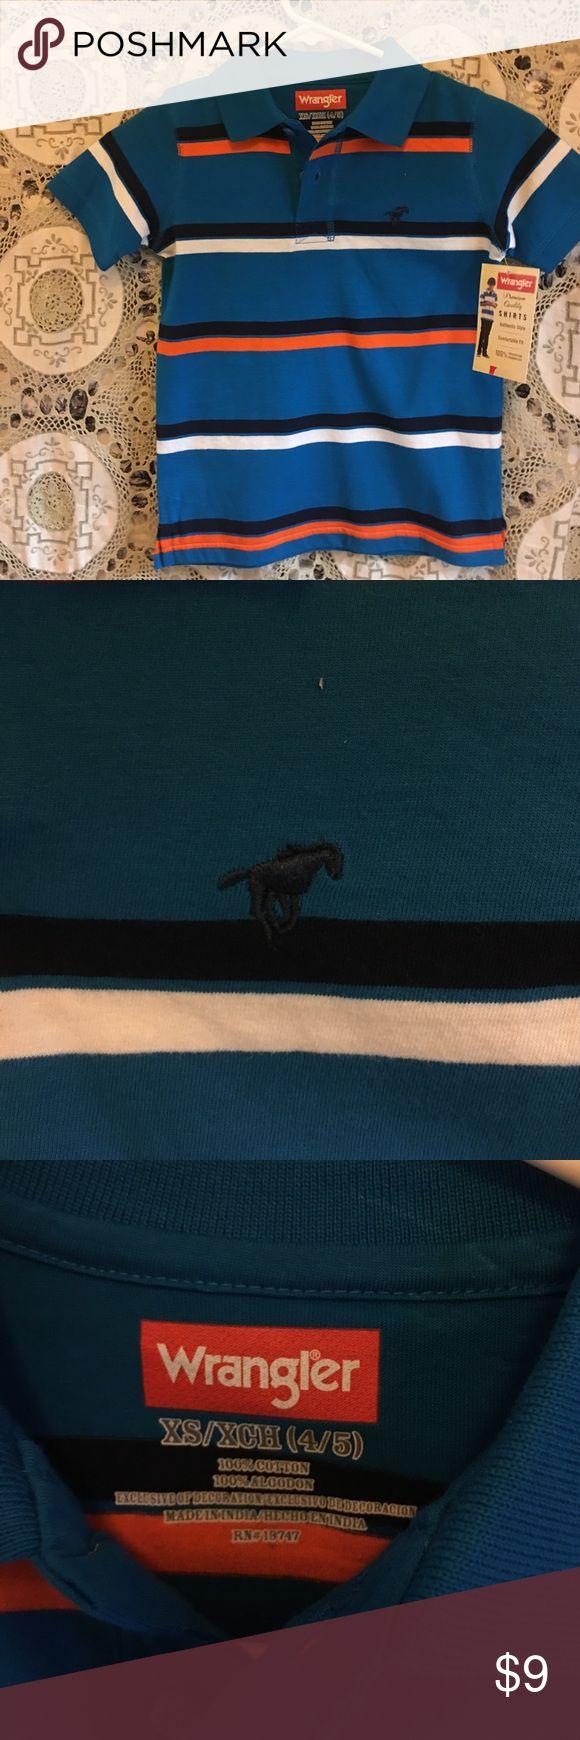 Wrangler striped polo top boys, Easter Great shirt for Easter Wrangler striped polo shirt Wrangler Shirts & Tops Polos